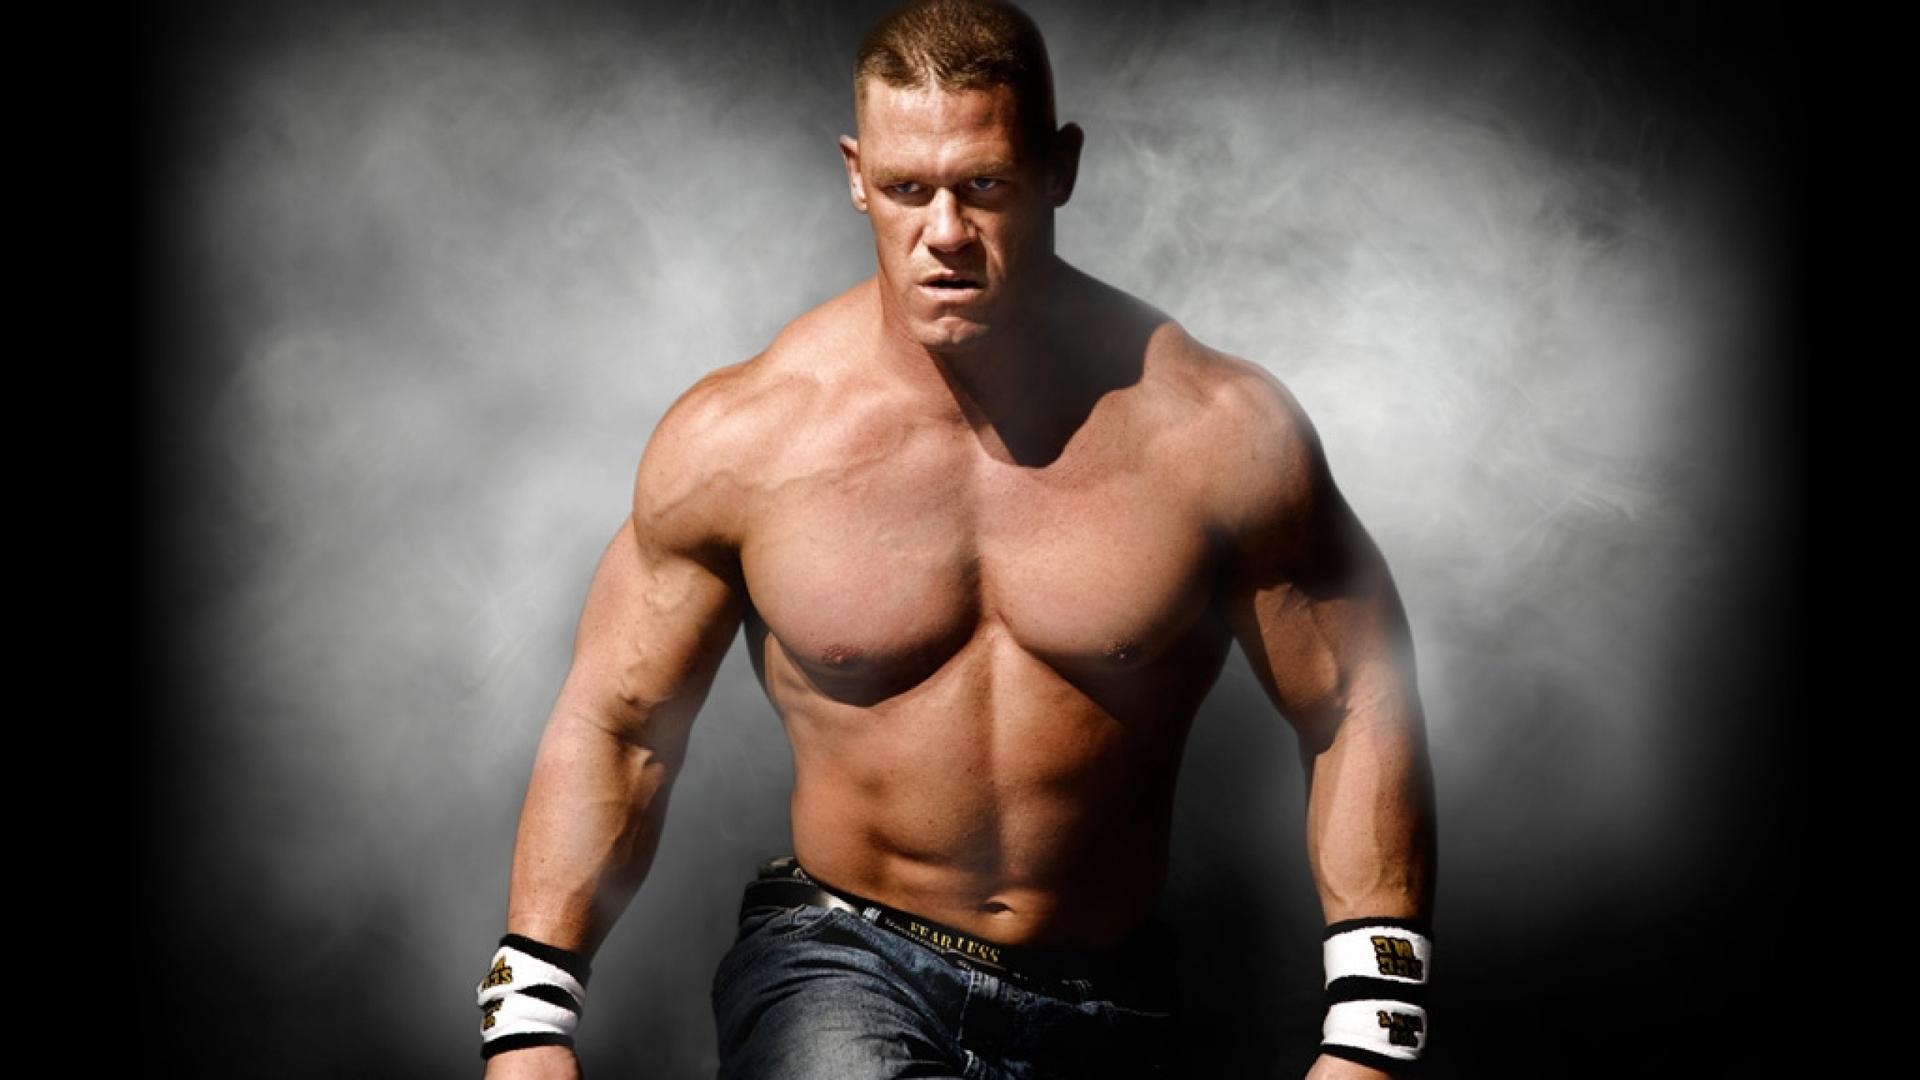 John-Cena-must-downloads-1920%C3%971080-Pics-Of-John-Cena-Ador-wallpaper-wp3407629